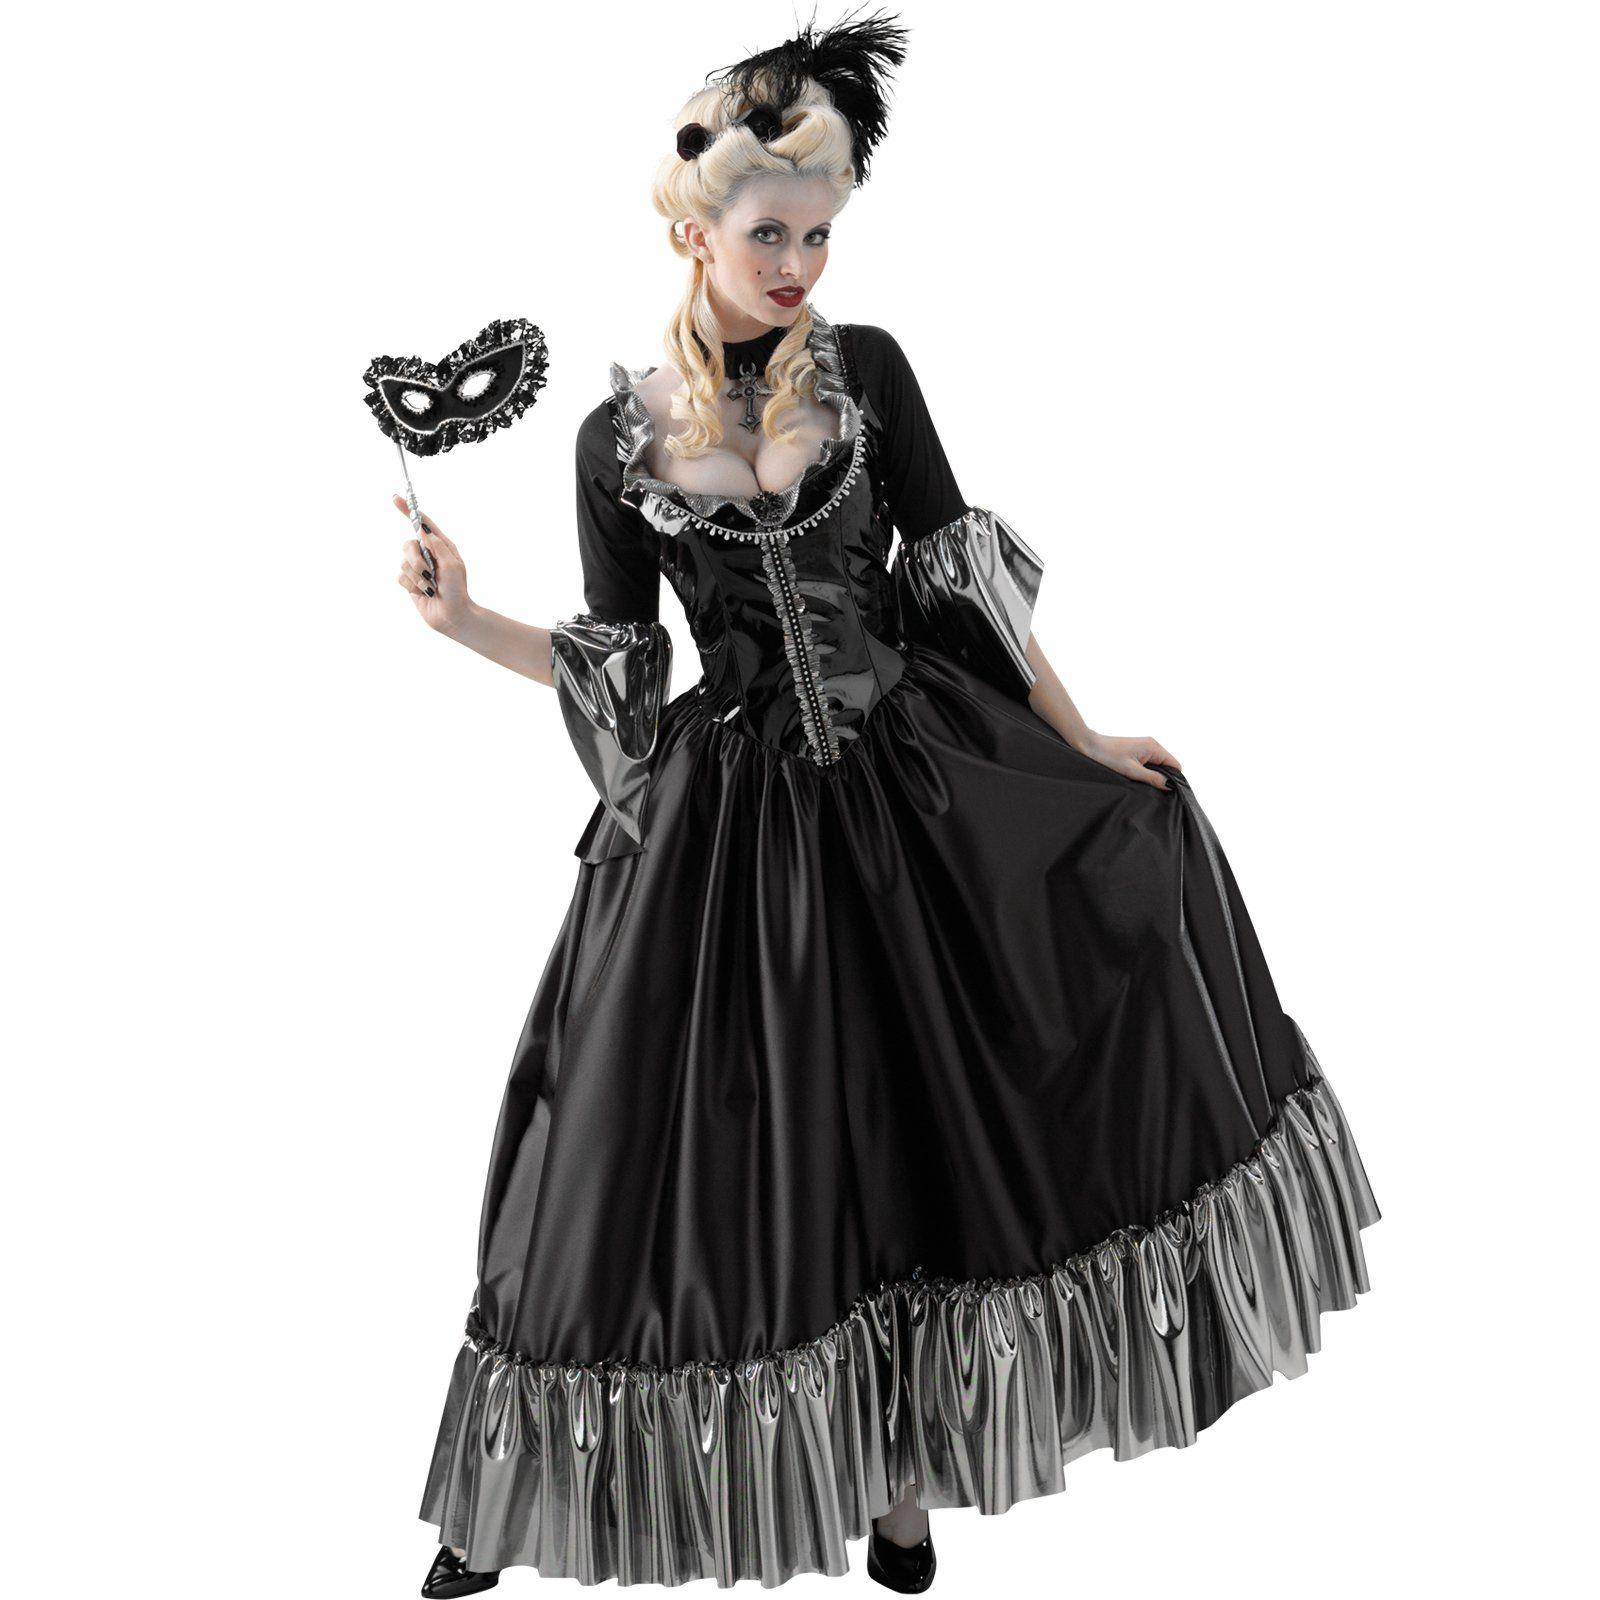 Awe Inspiring Renaissance Princess Womens Dress Costume Ball Dresses Hairstyles For Women Draintrainus